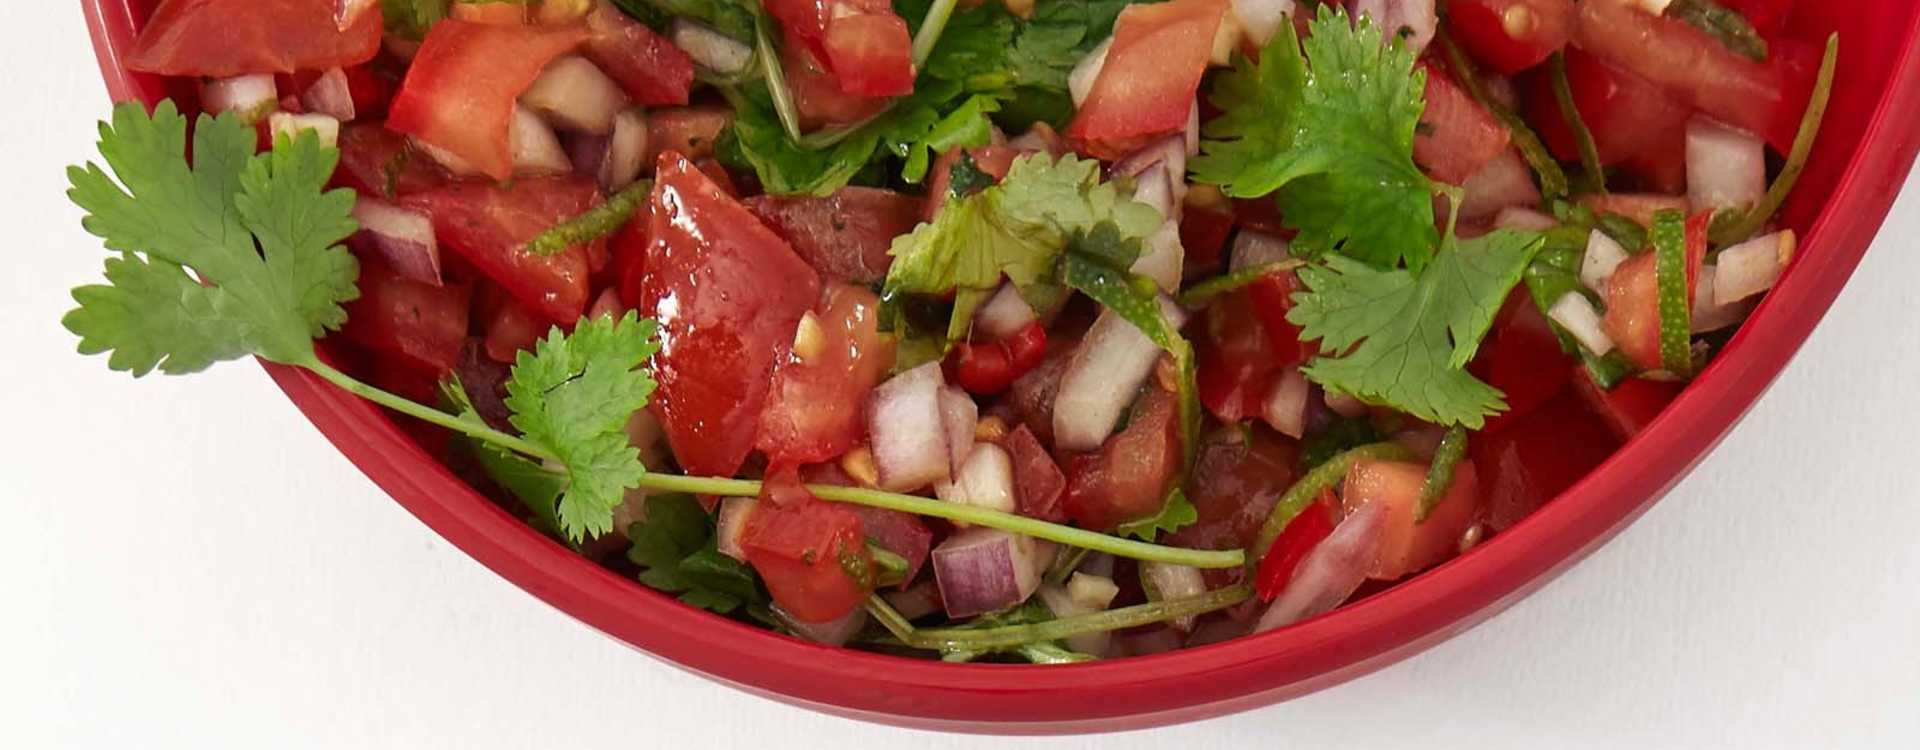 Tomat og rødløkssalsa